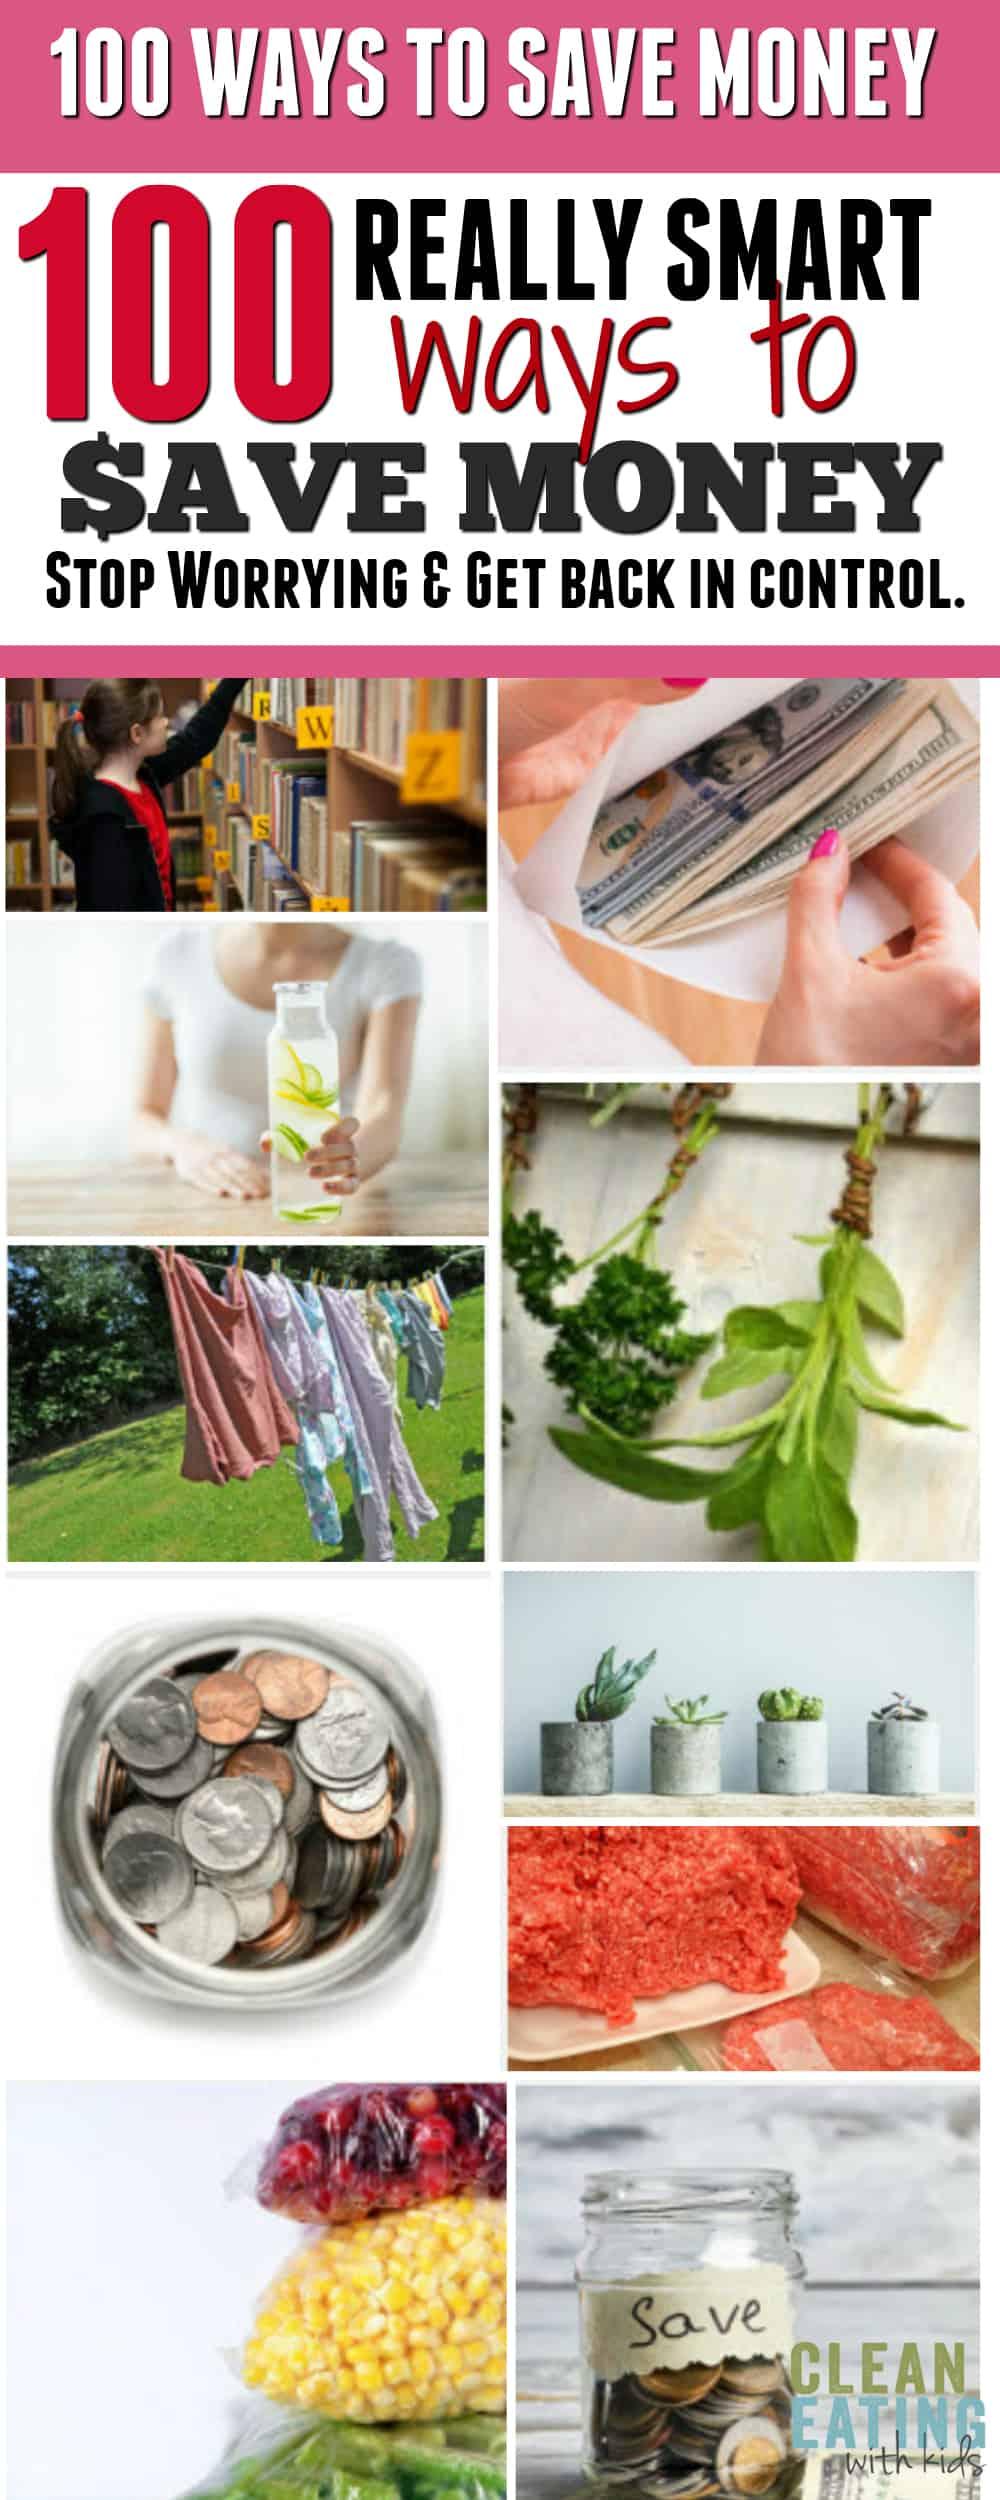 100 (UPDATE: Now 200) Money Saving Ideas + Printable Checklist and Money Saving Challenges